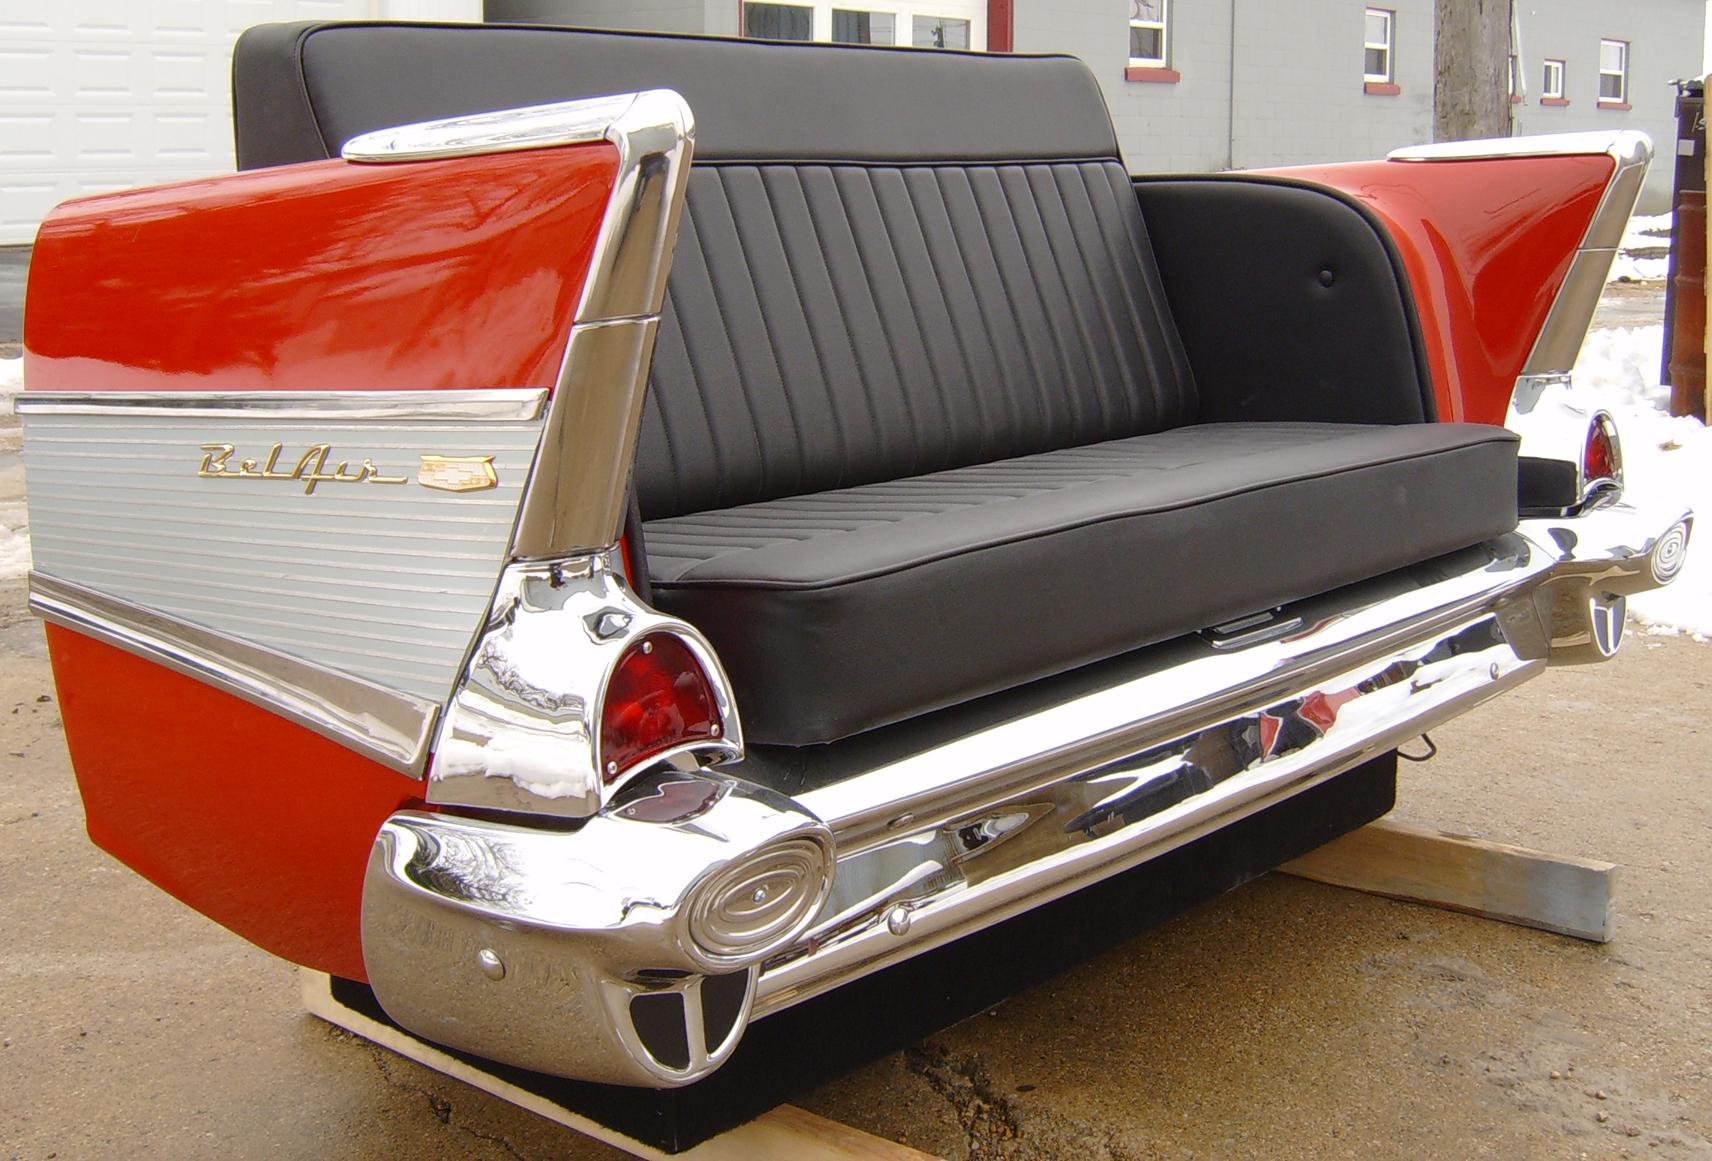 New Retro Cars Restored Classic Car Furniture And Decor